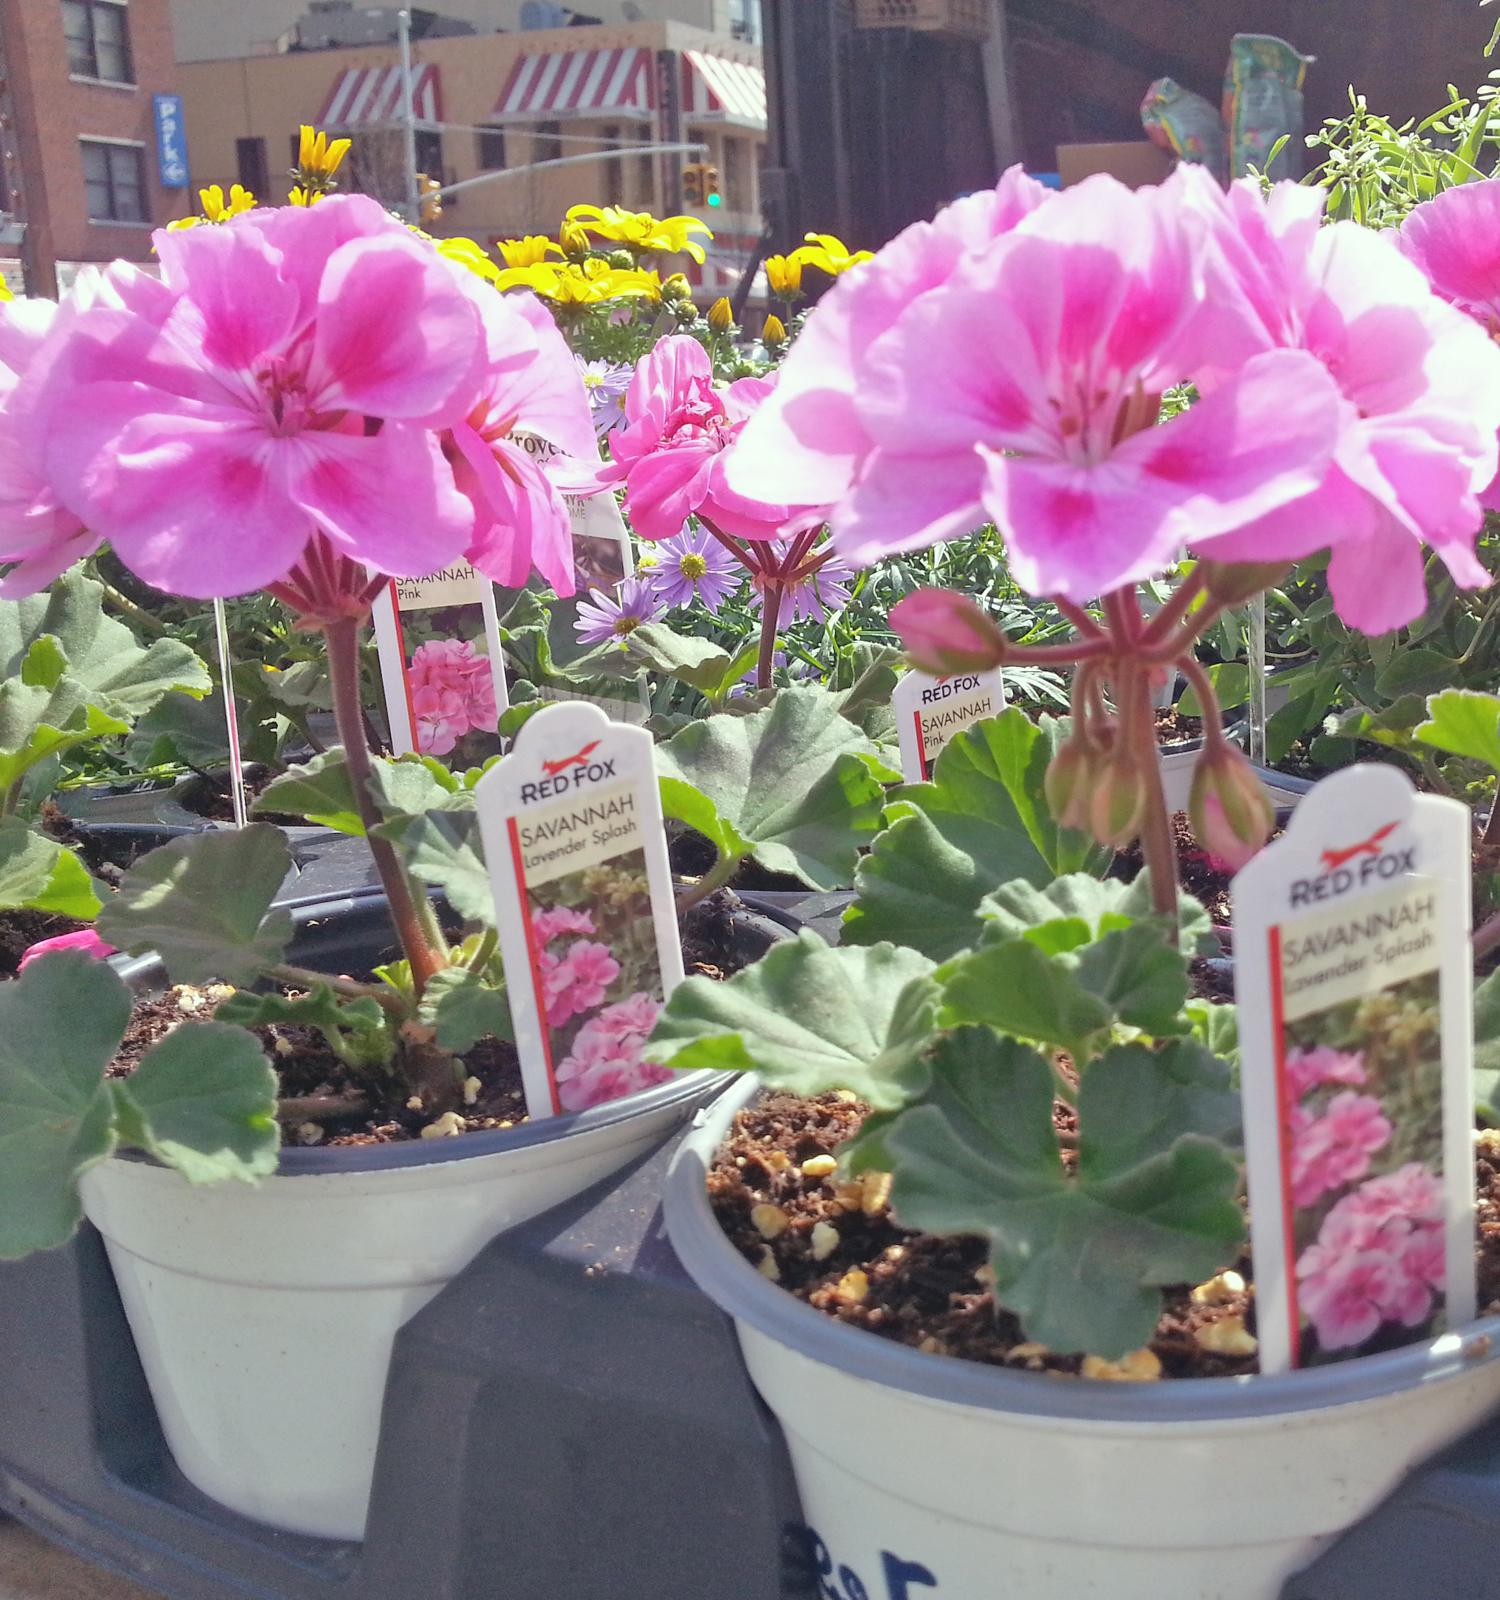 usq-flowers-8